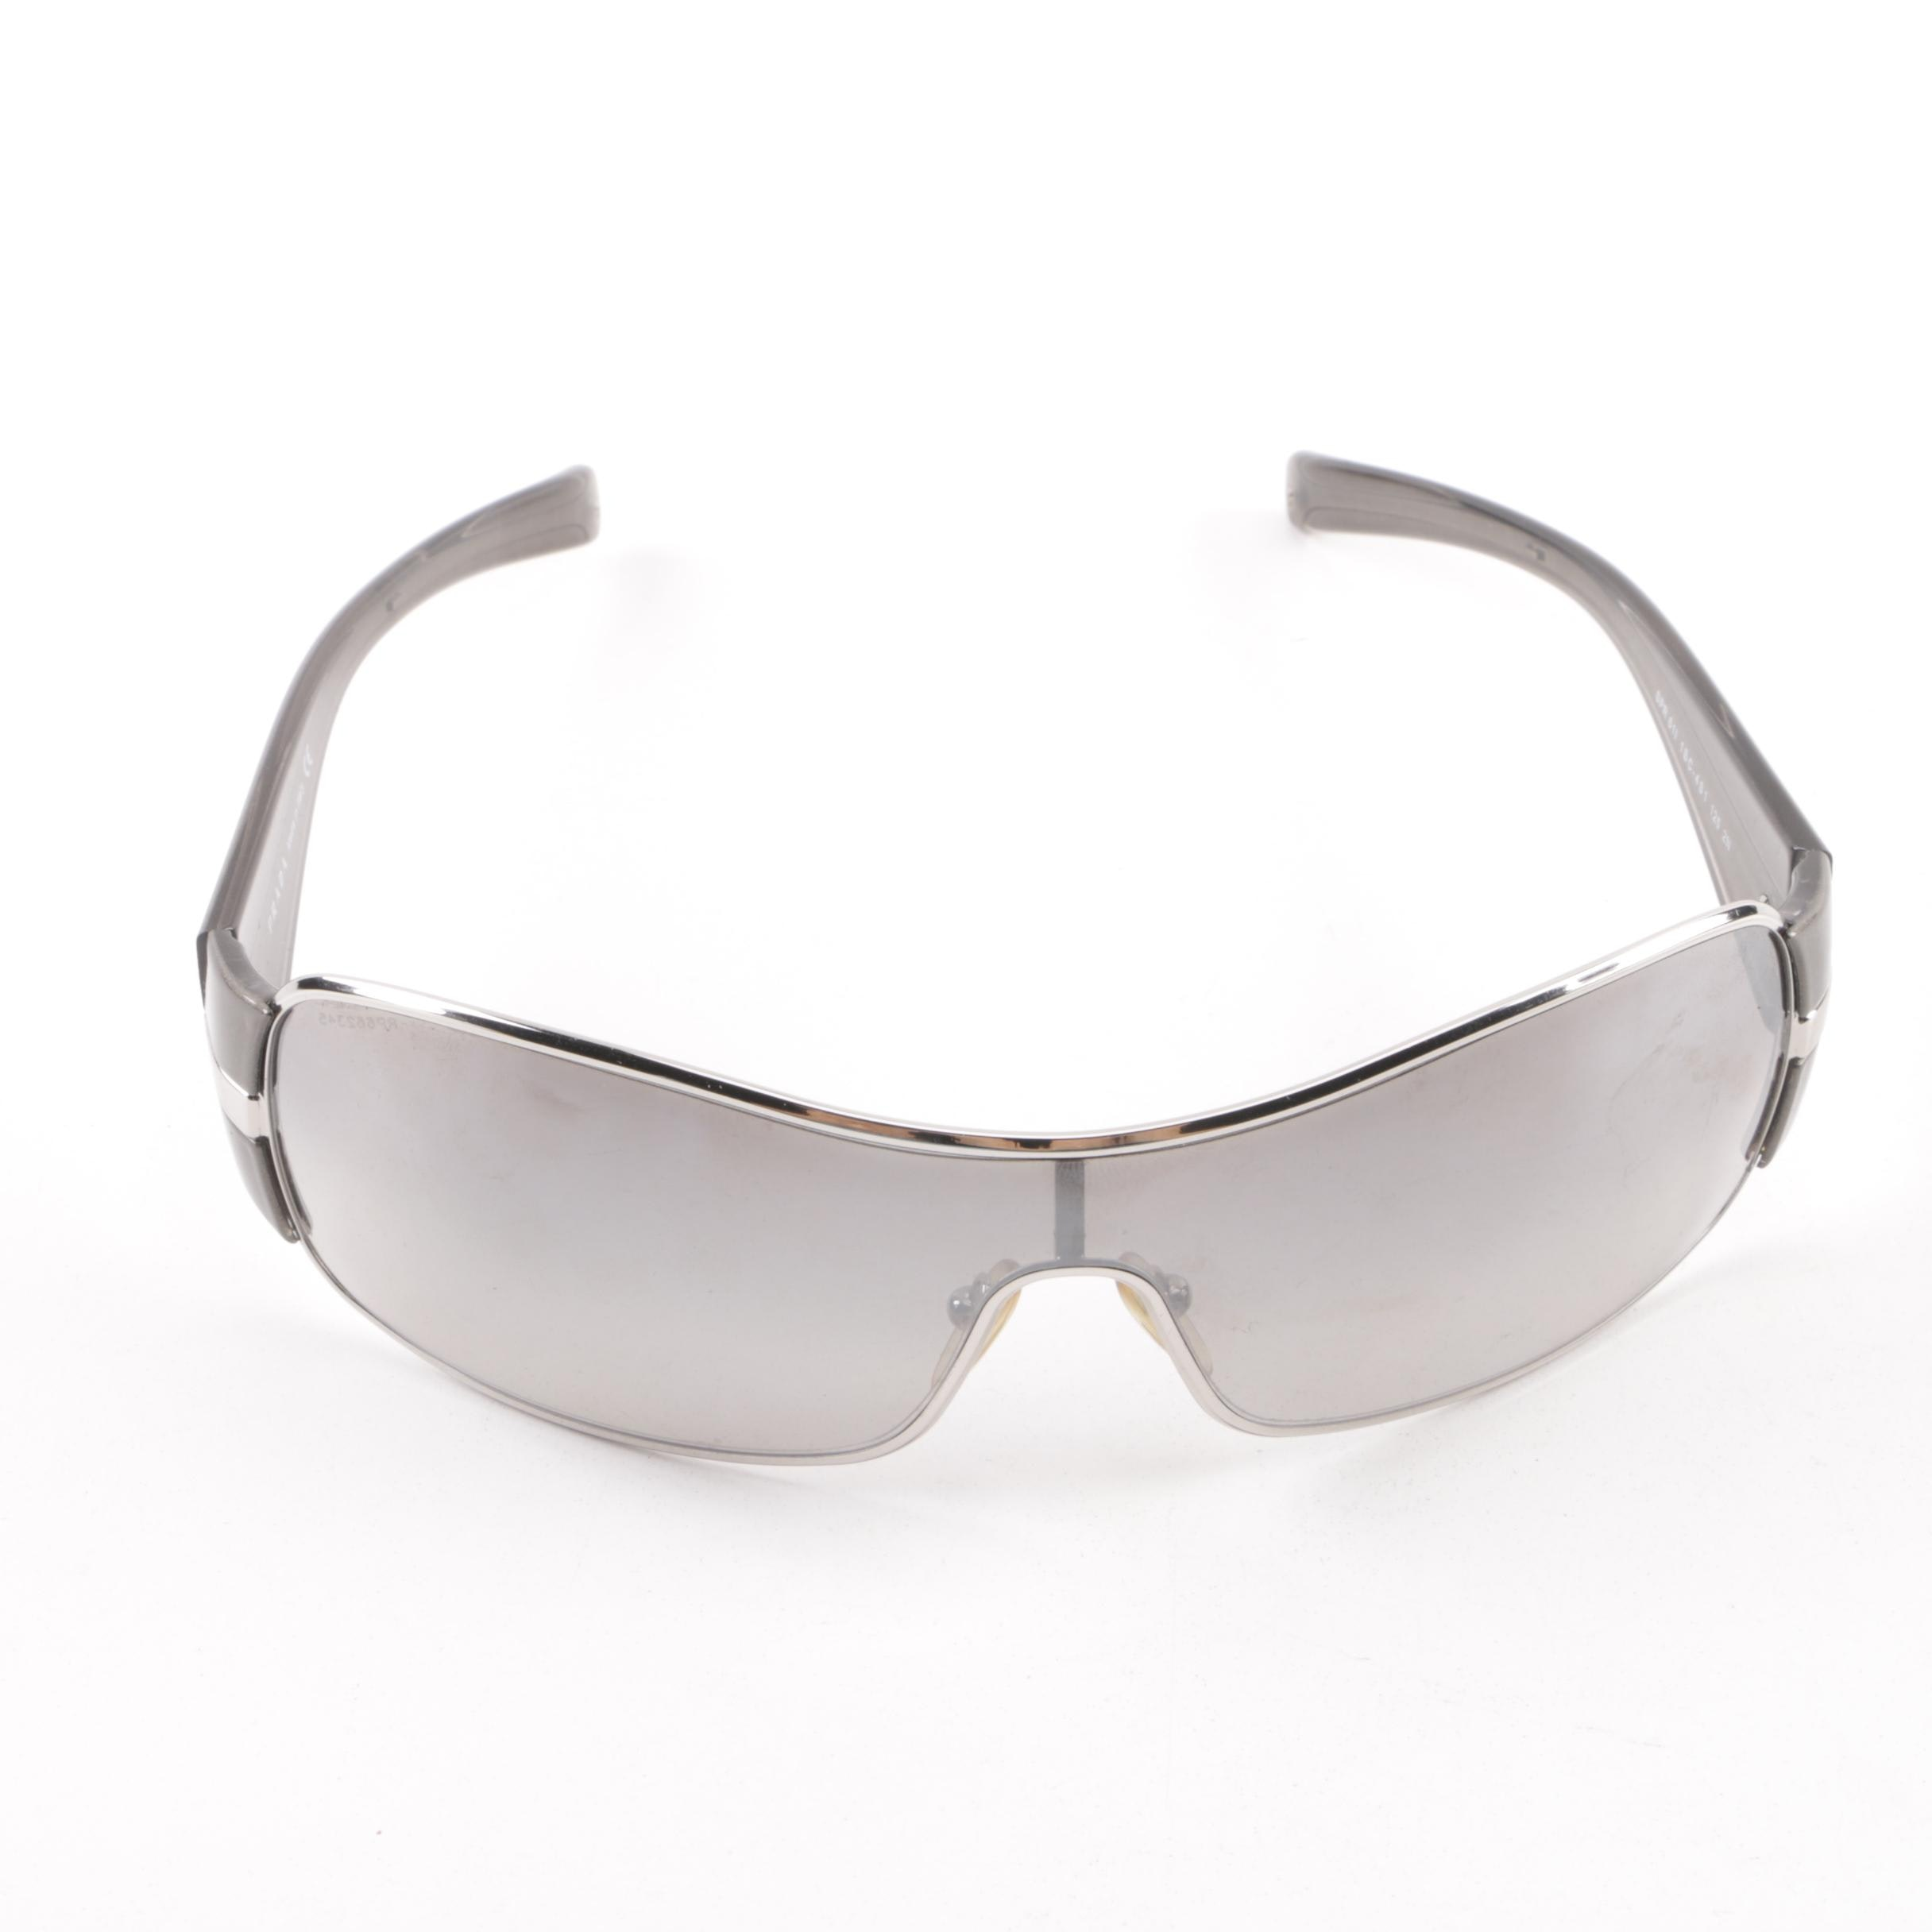 Prada SPR 61I Silver and Grey Shield Sunglasses